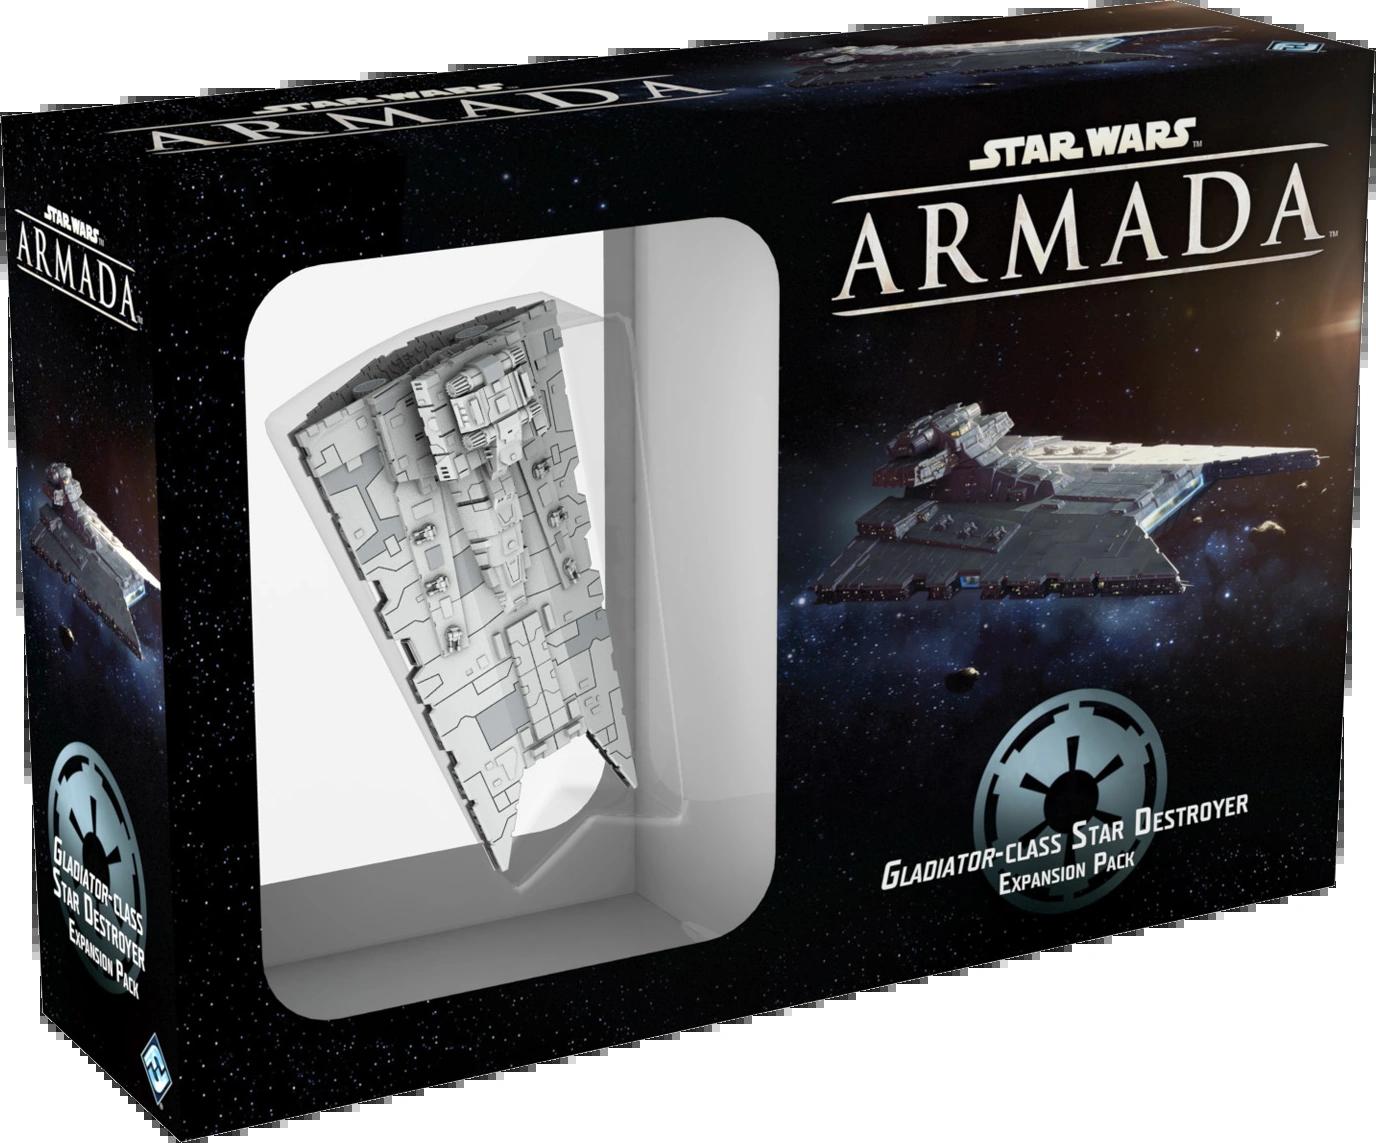 Star Wars: Armada - Gladiator-Class Star Destroyer